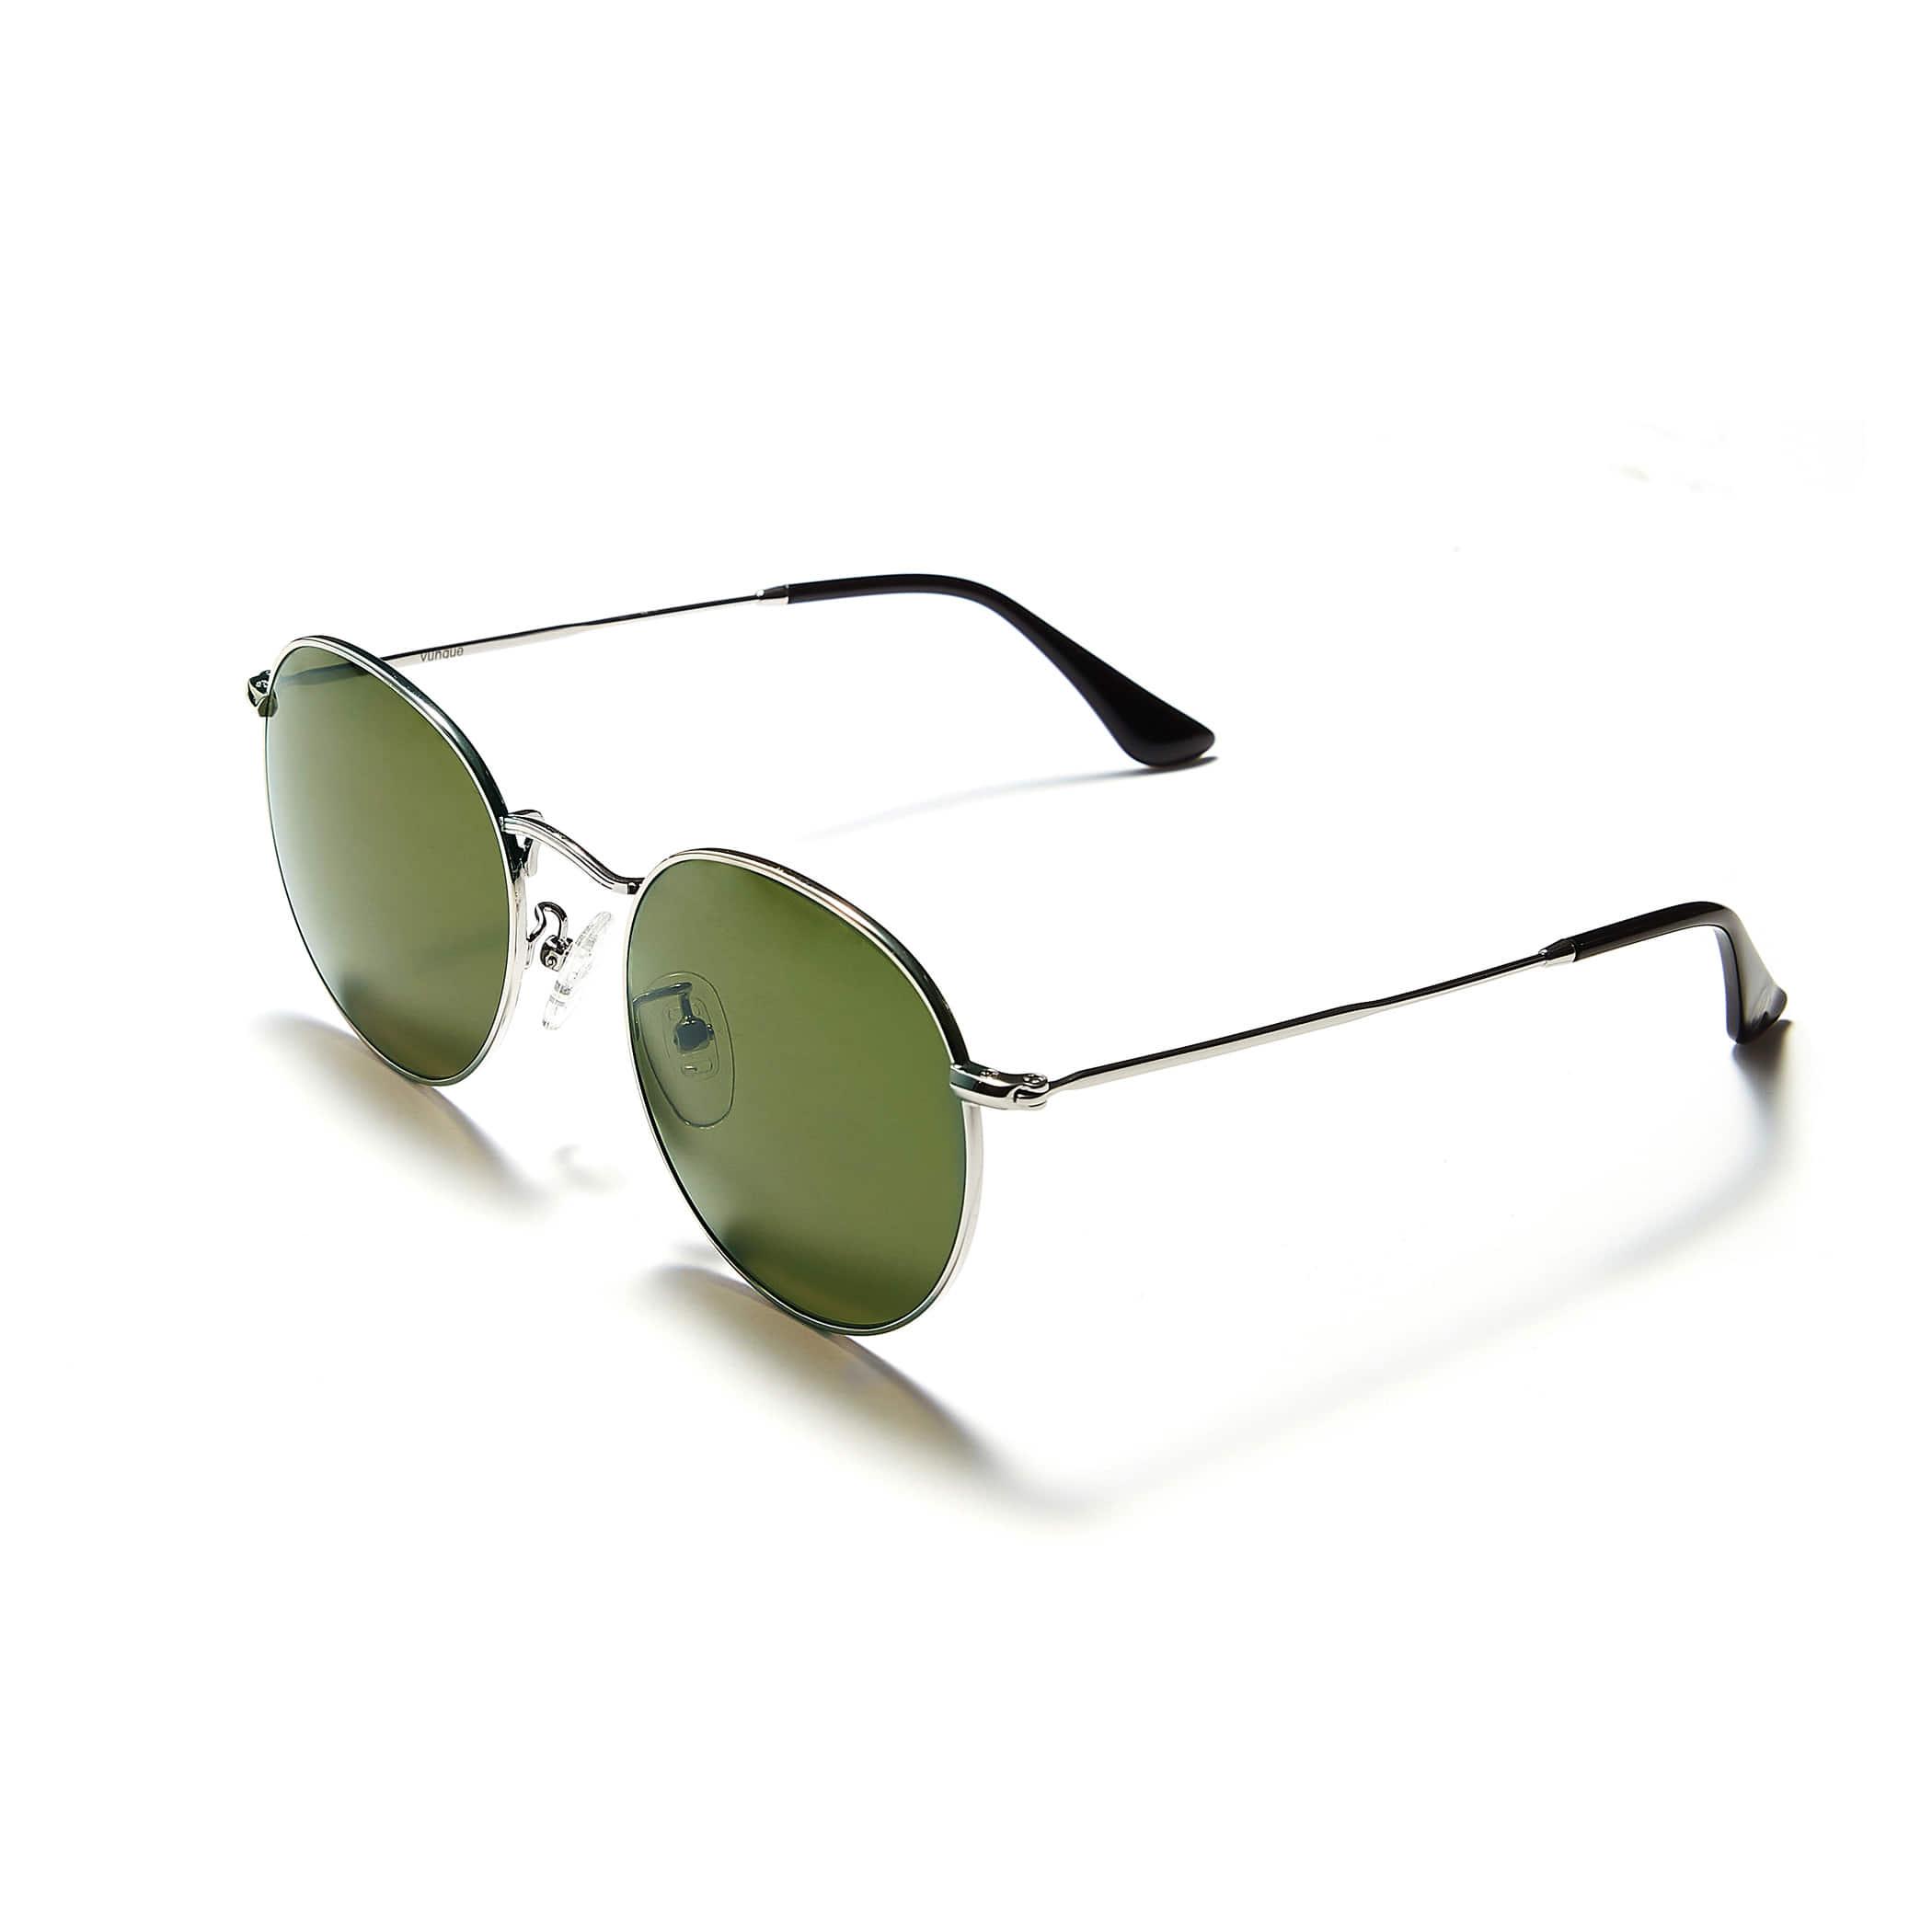 Occam Sunglasses (오캄 선글라스) Green